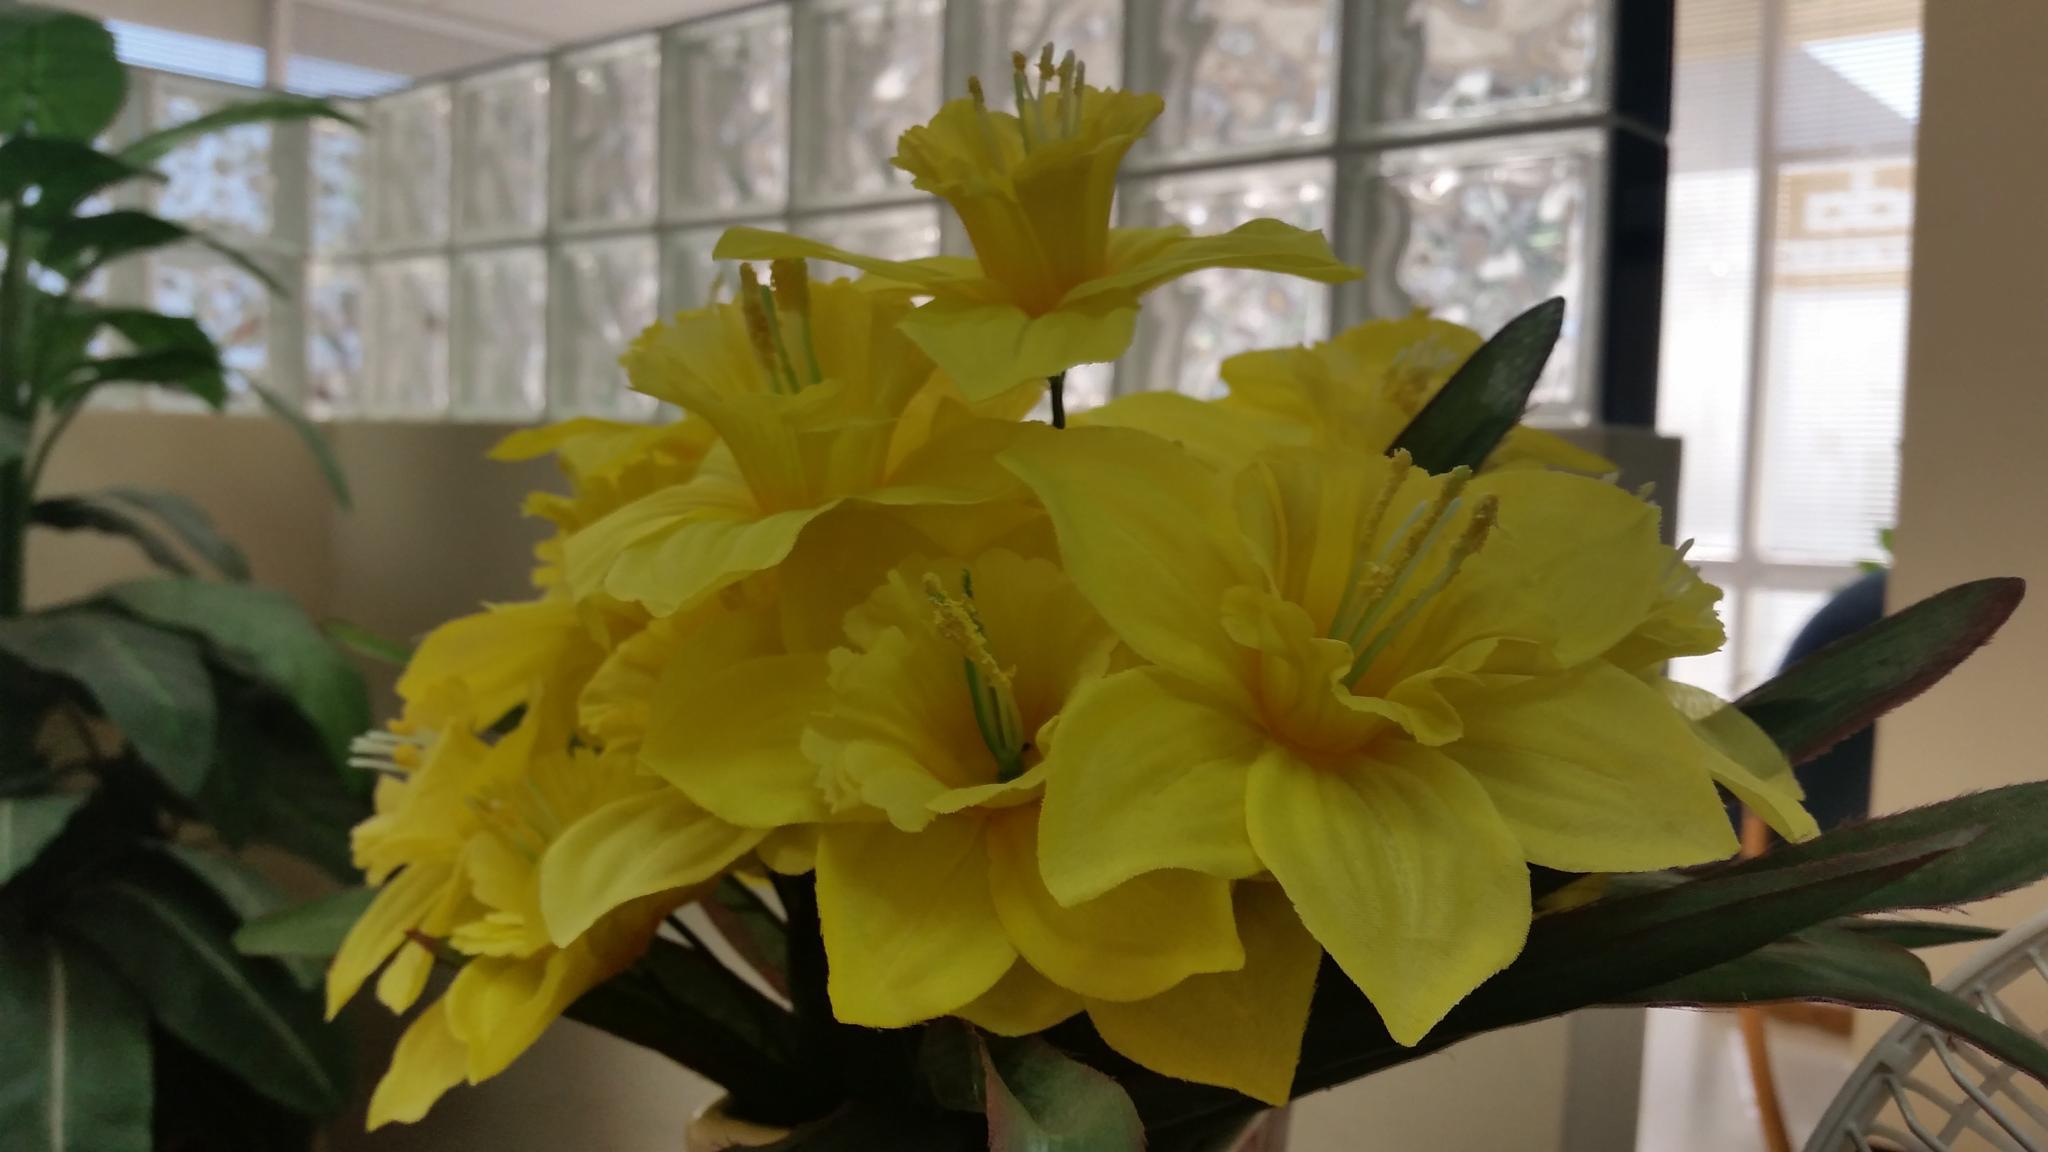 Not so Mellow Yellow by WickedVegas